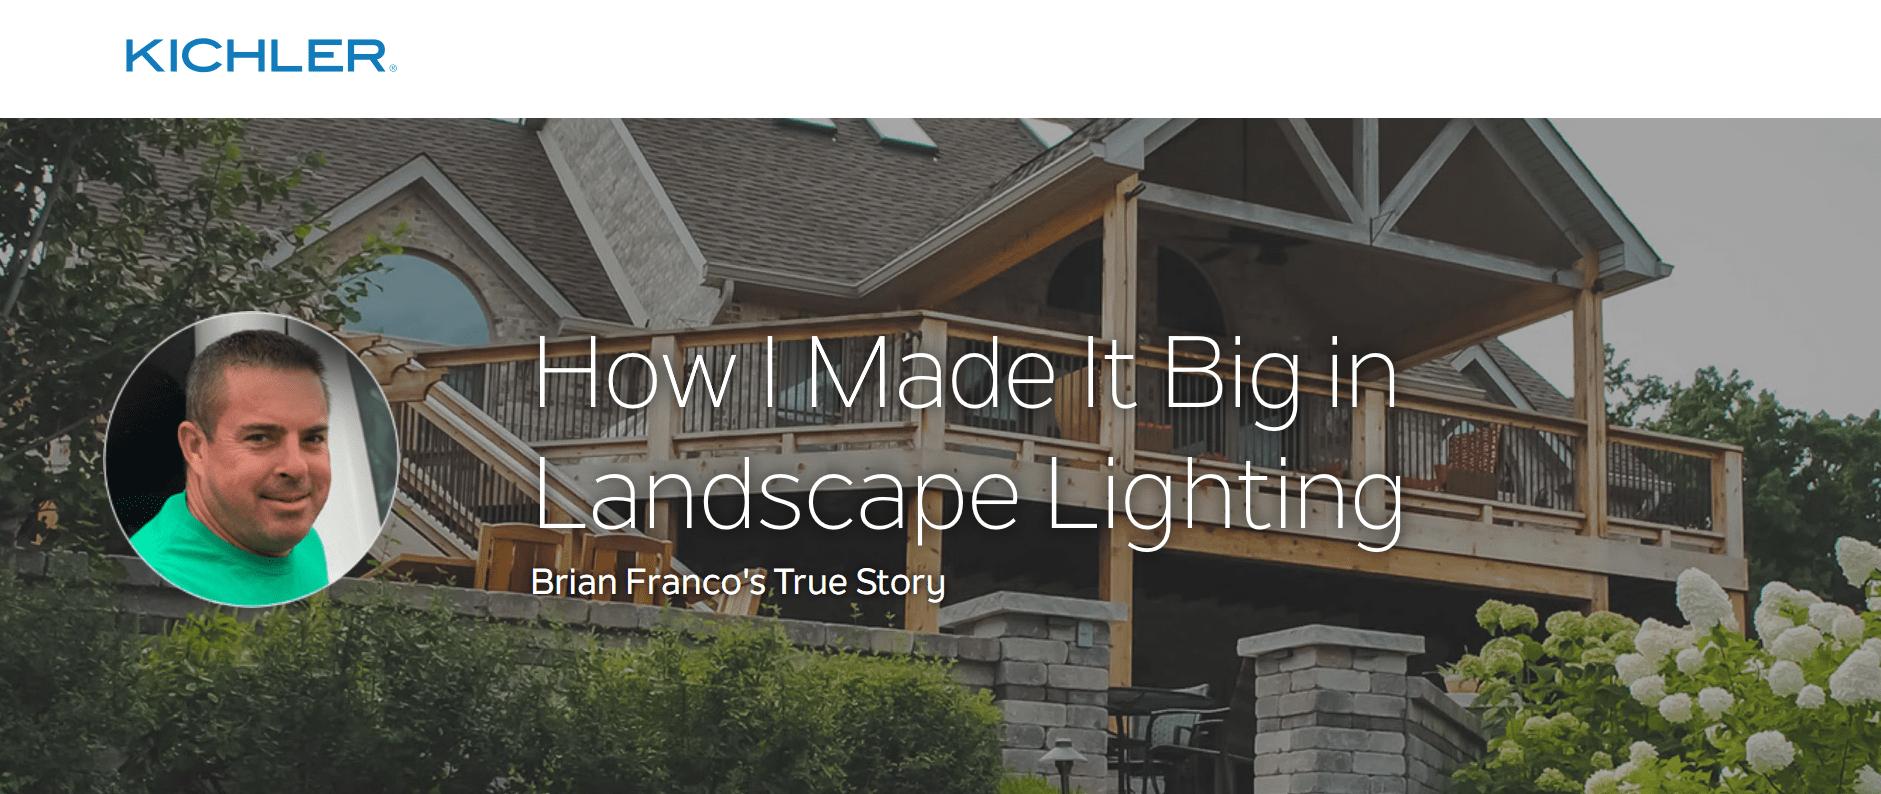 Kichler Professional Landscape Lighting -- Content Marketing Pilot Program